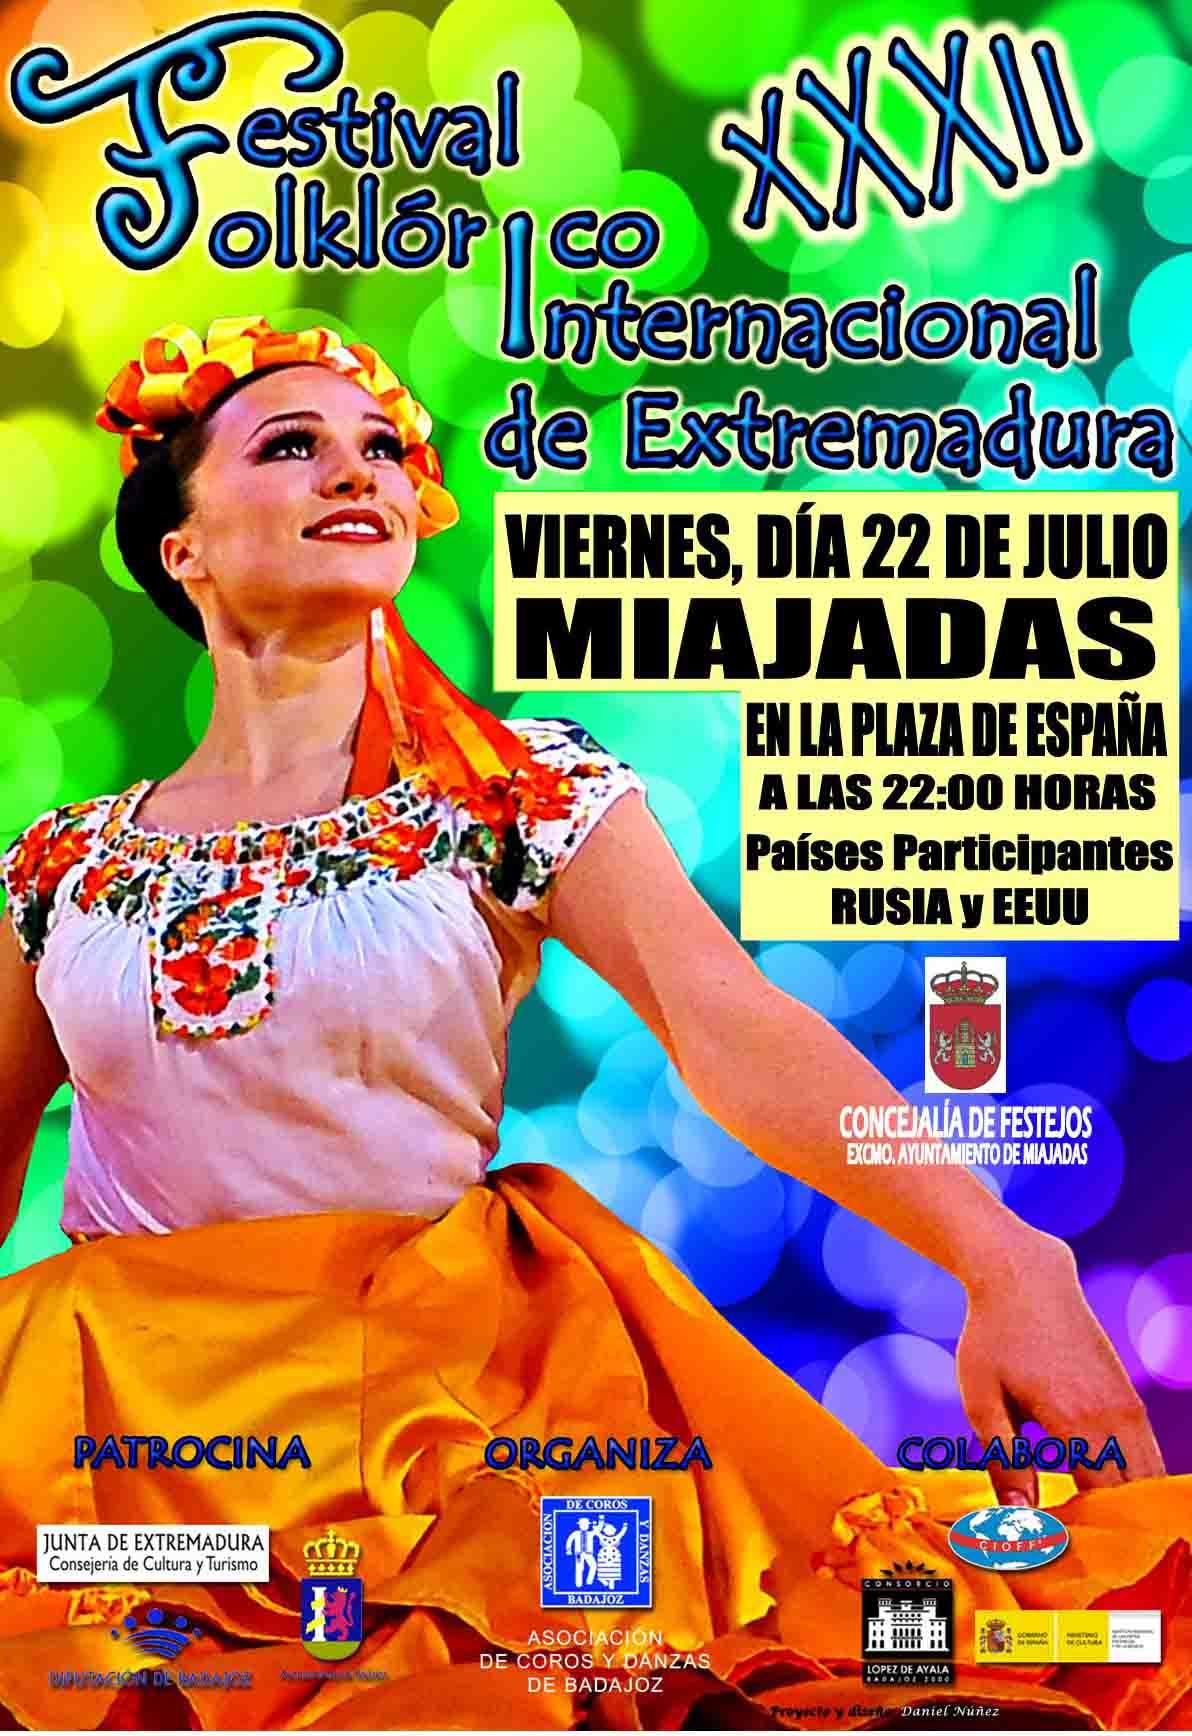 XXXII Edición del Festival Folklórico Internacional de Extremadura